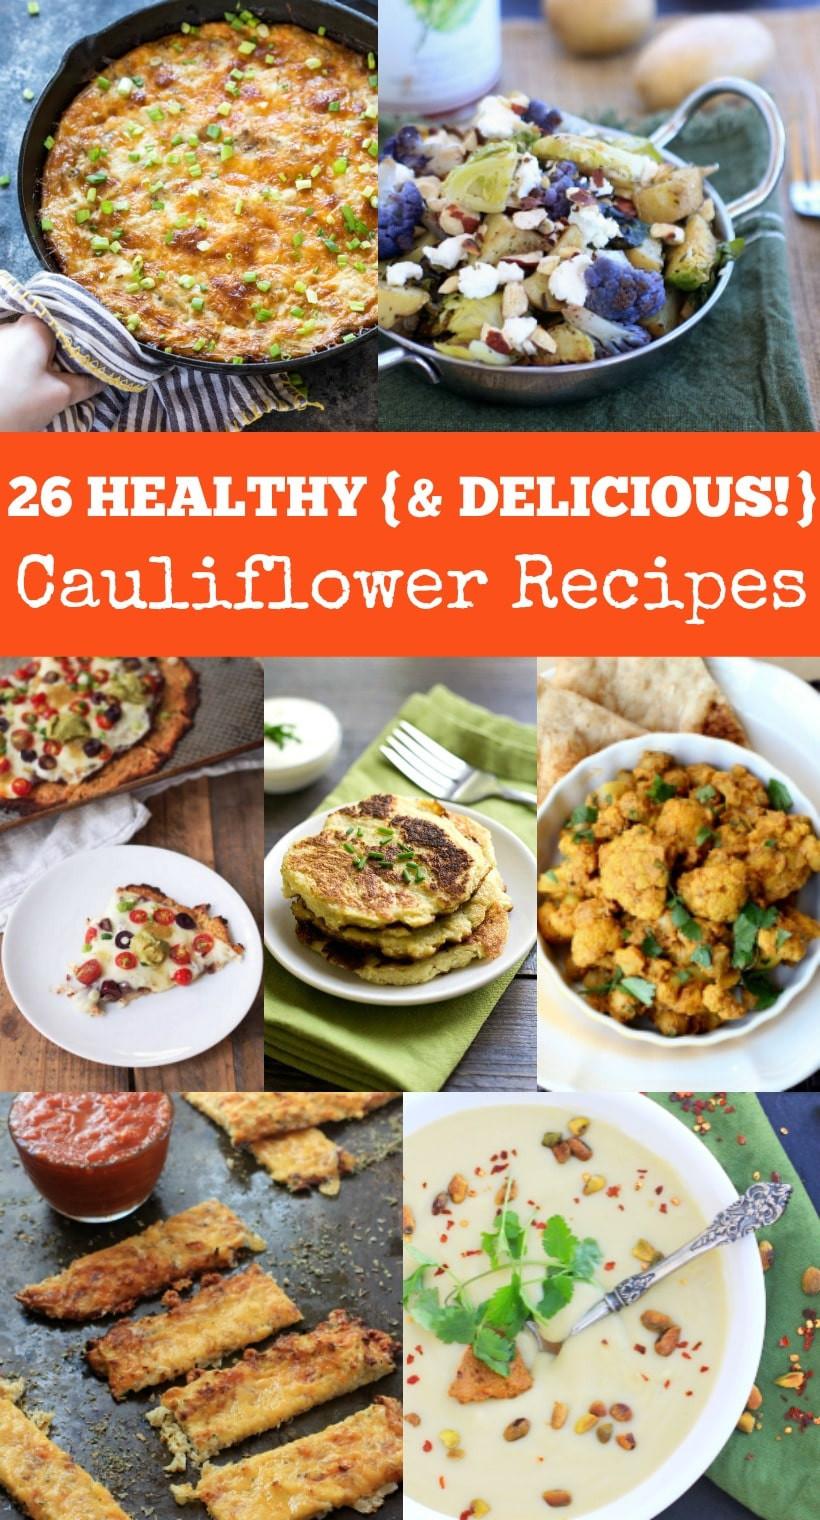 Is Cauliflower Healthy  26 Creative Healthy Cauliflower Recipes Cauliflower